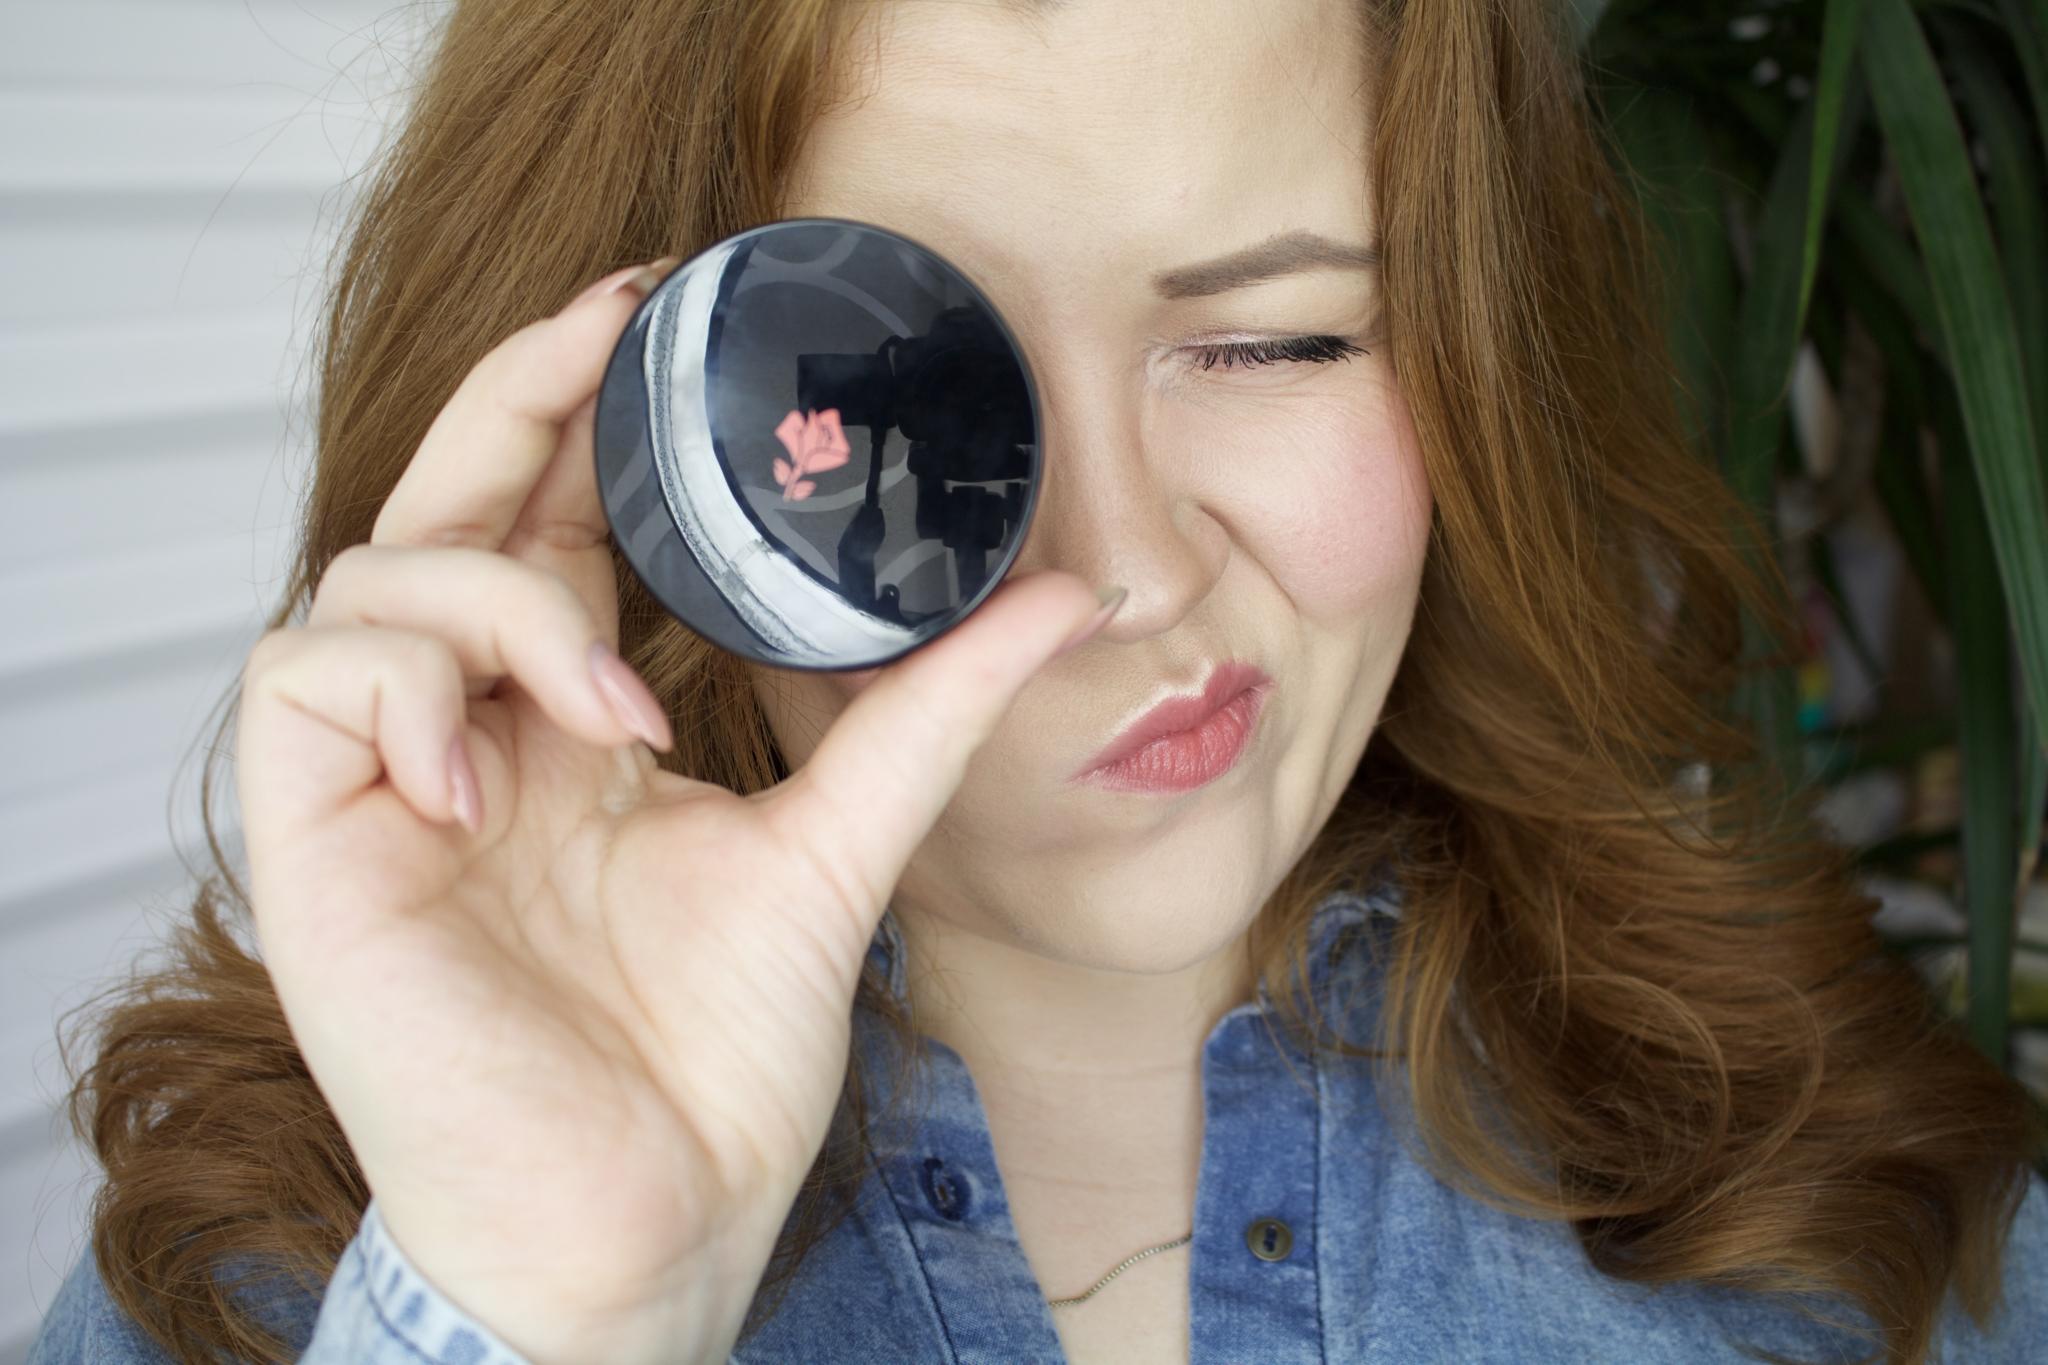 Cushion Blush von Lancome - Mein Oster Make-up Look: peach & glowy mit Lancome & YSL - Beauty Blog Leipzig